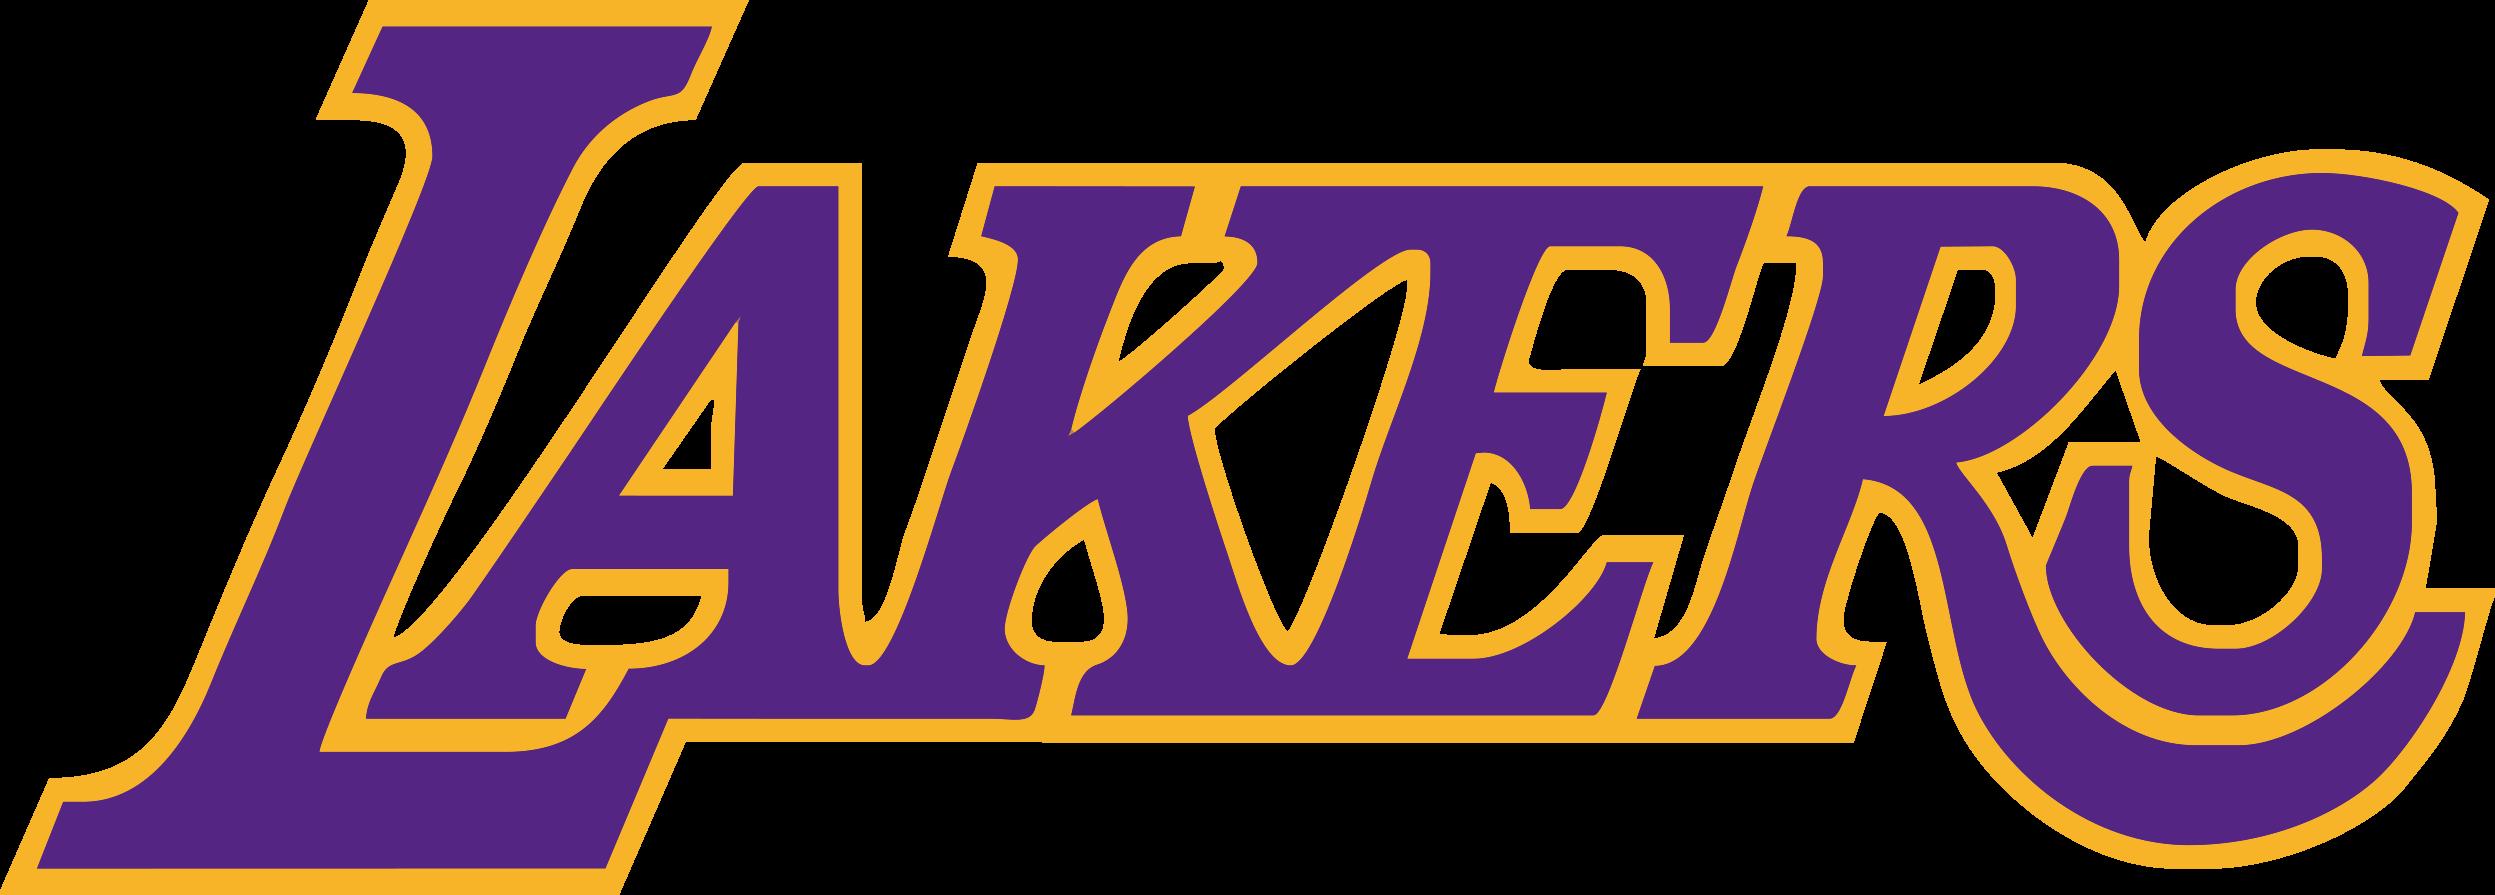 Los Angeles Lakers Logo Font - Lakers Logo (1200x600), Png ...